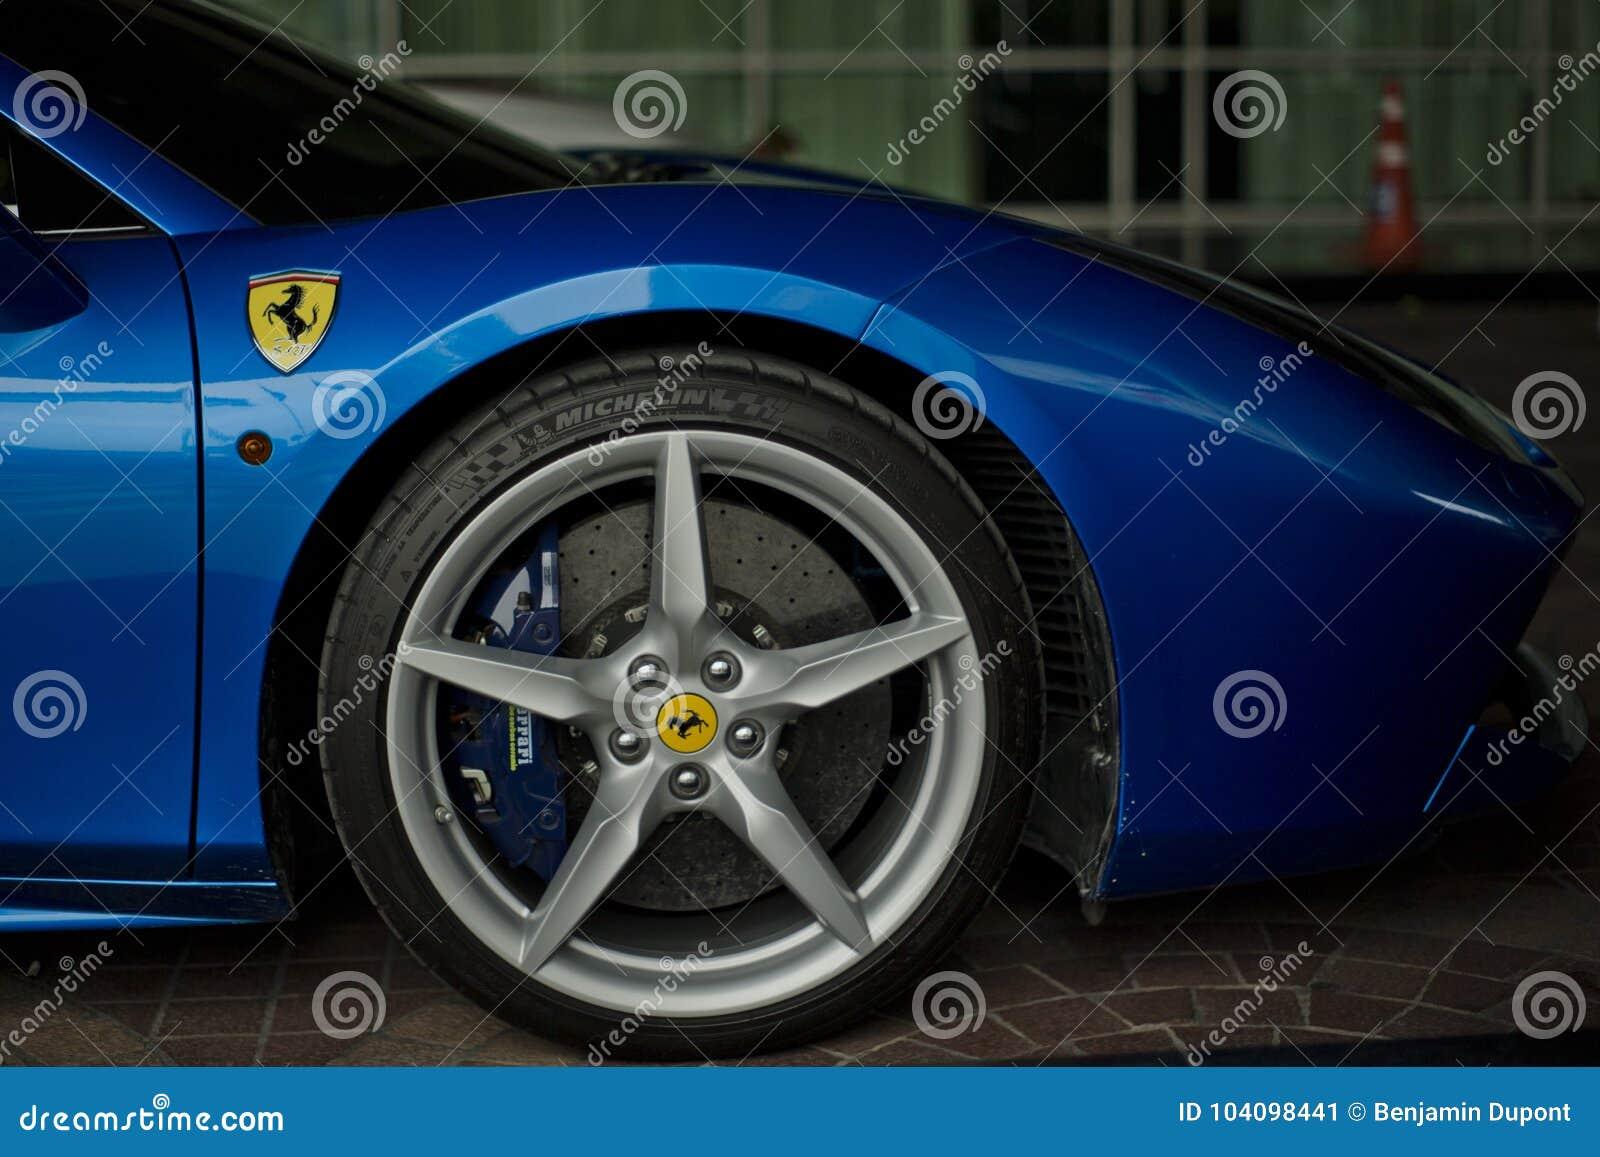 Ferrari 488 Spider Blue Close Up Editorial Photo Image Of Close Parking 104098441